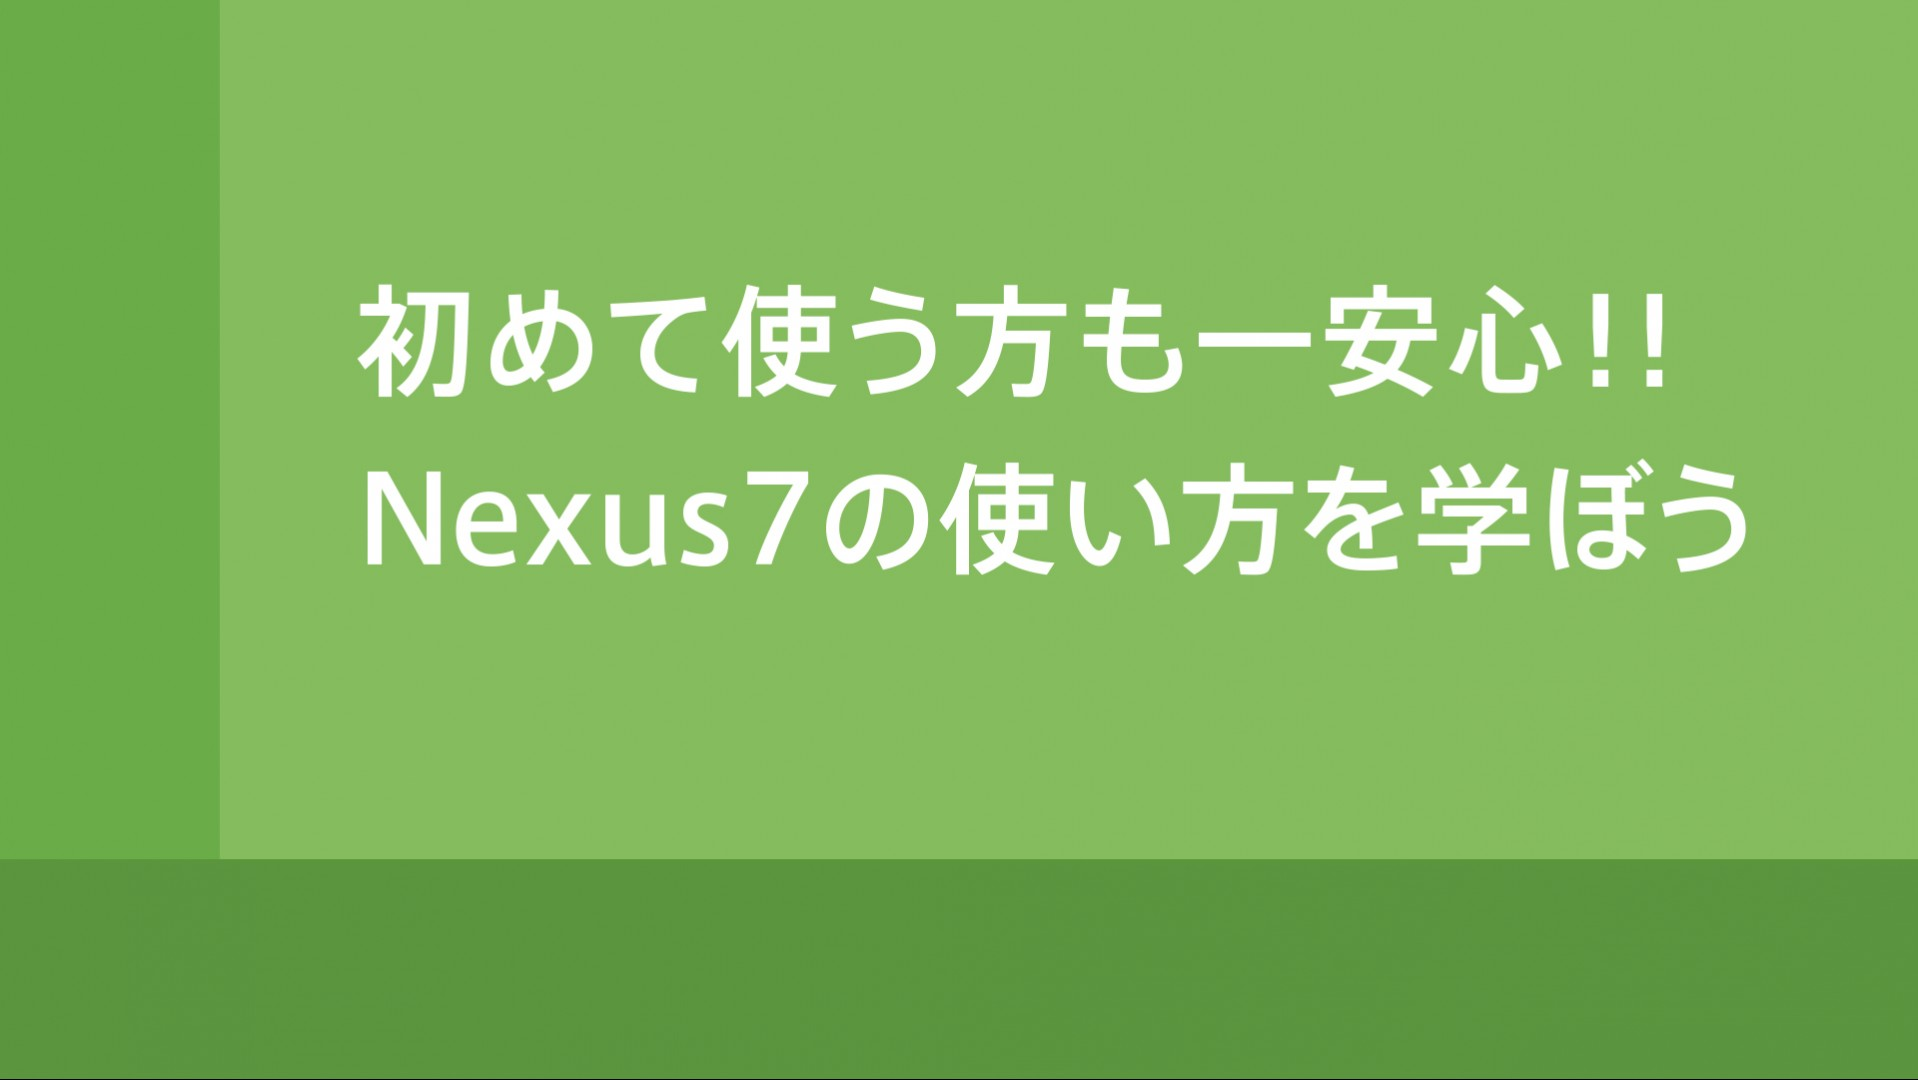 Nexus7 Web検索を使う方法